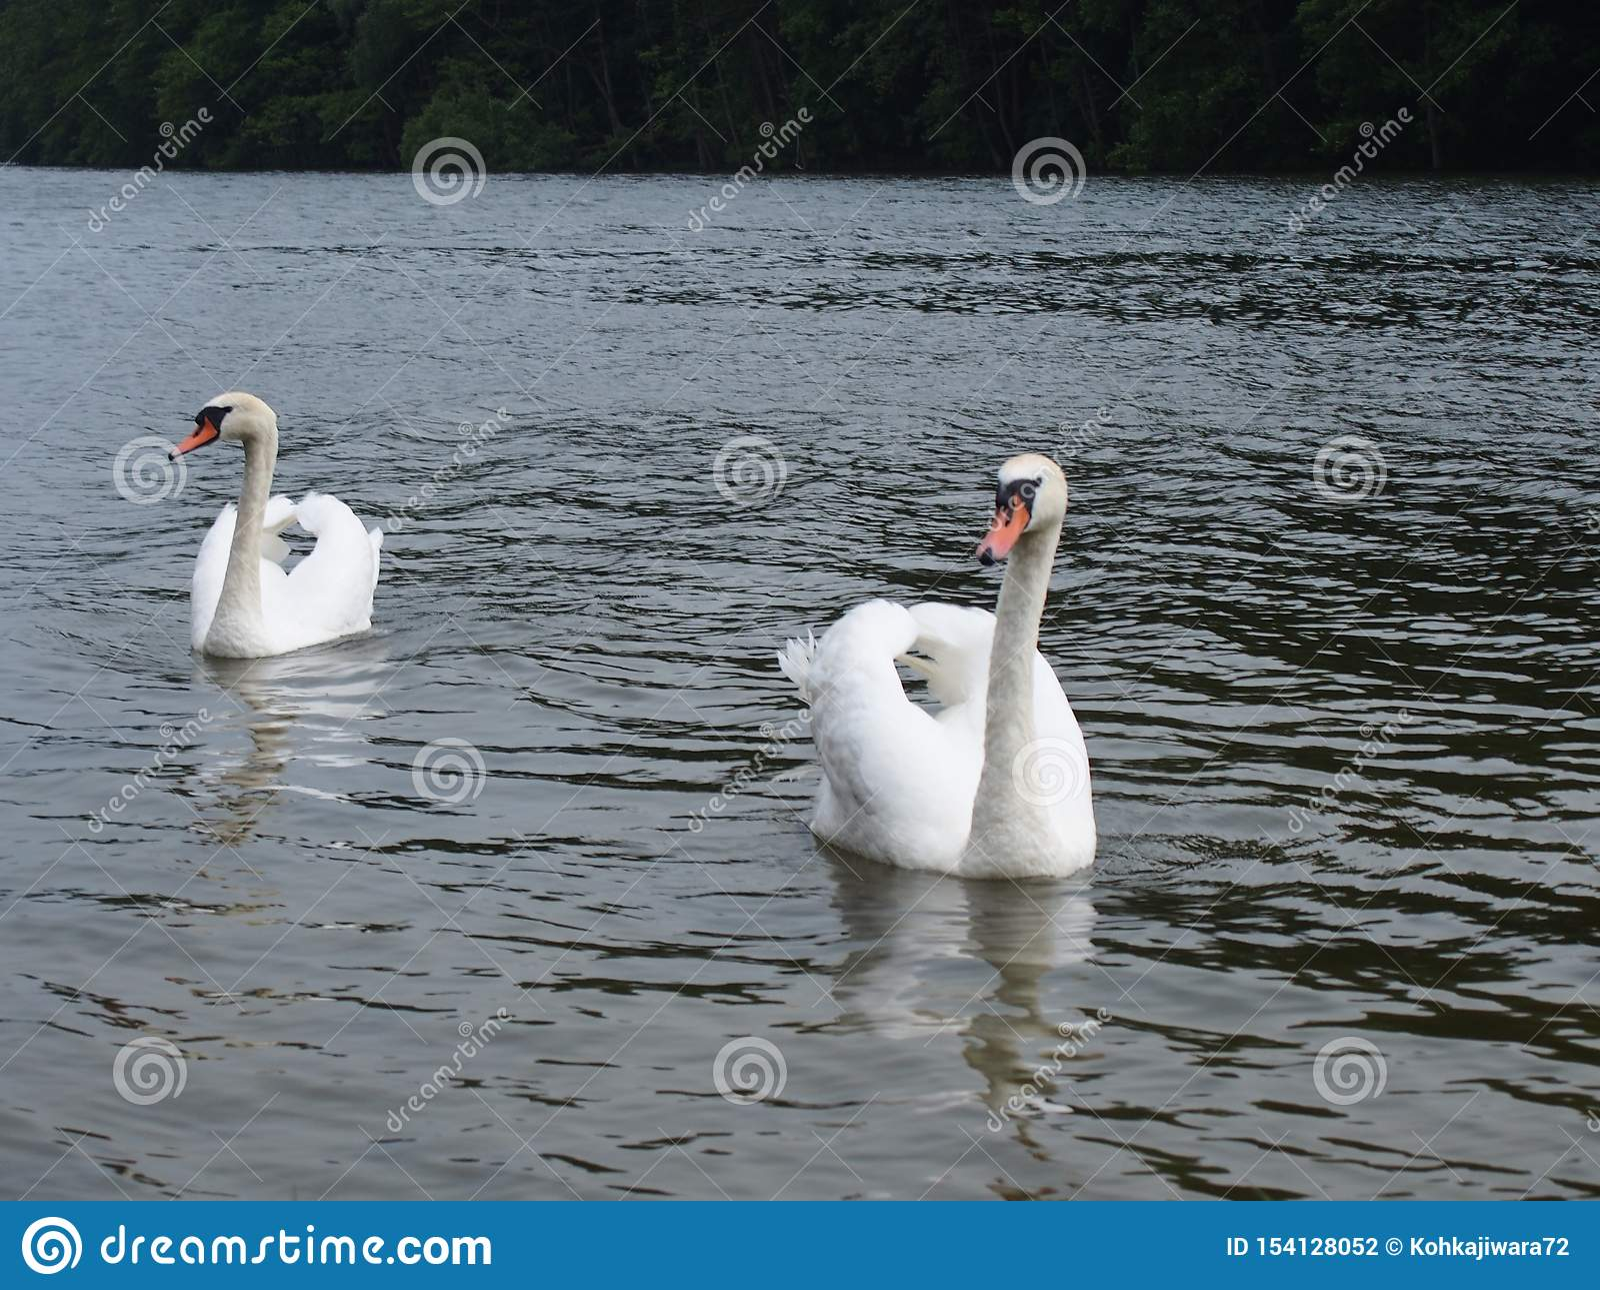 Two white swans in a lake Szczedin Poland 2013